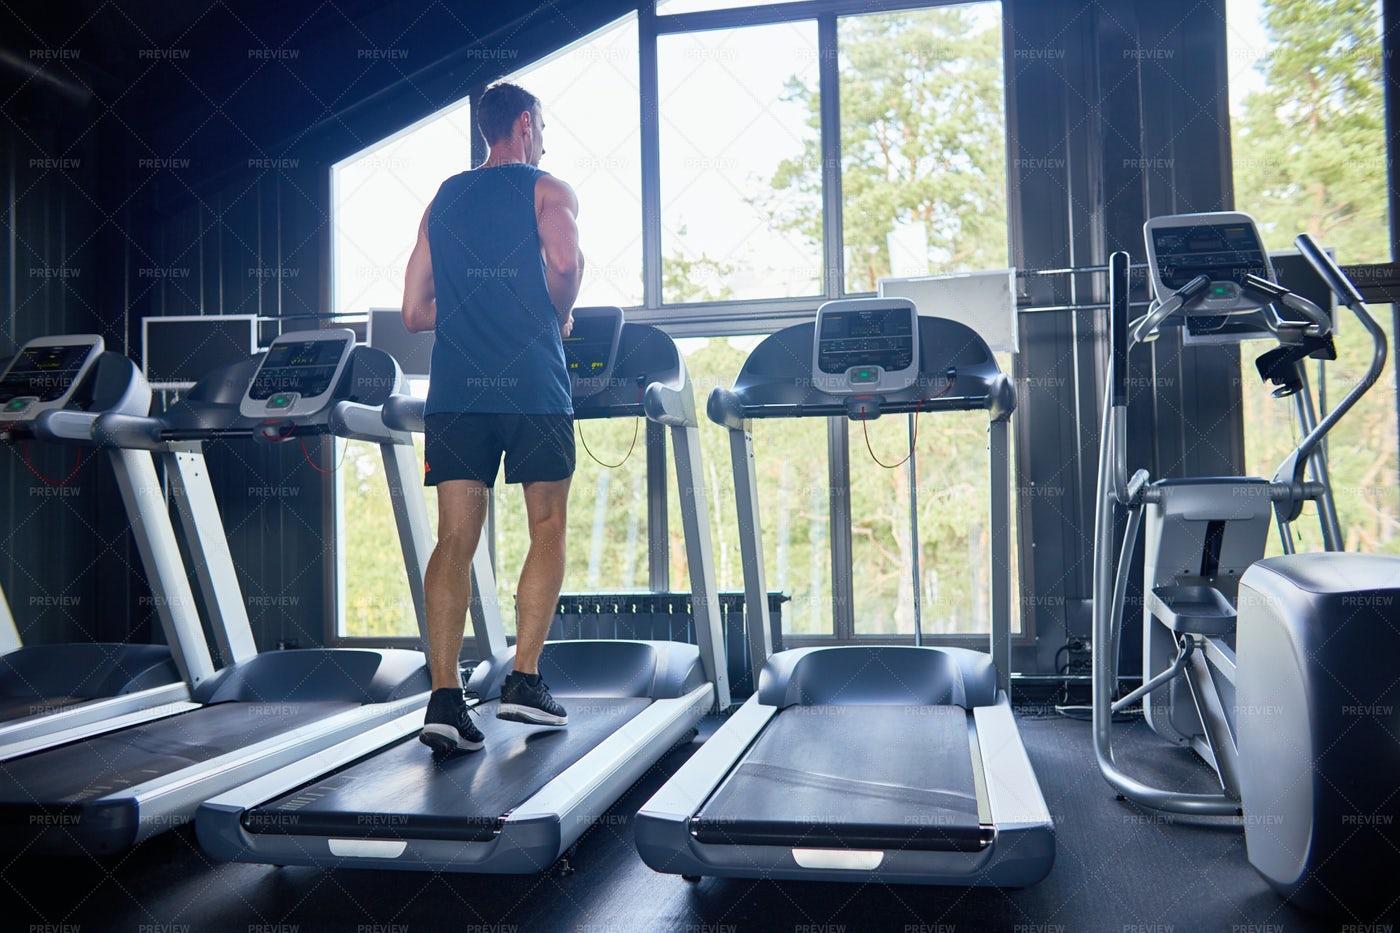 Running On Treadmill At Gym: Stock Photos